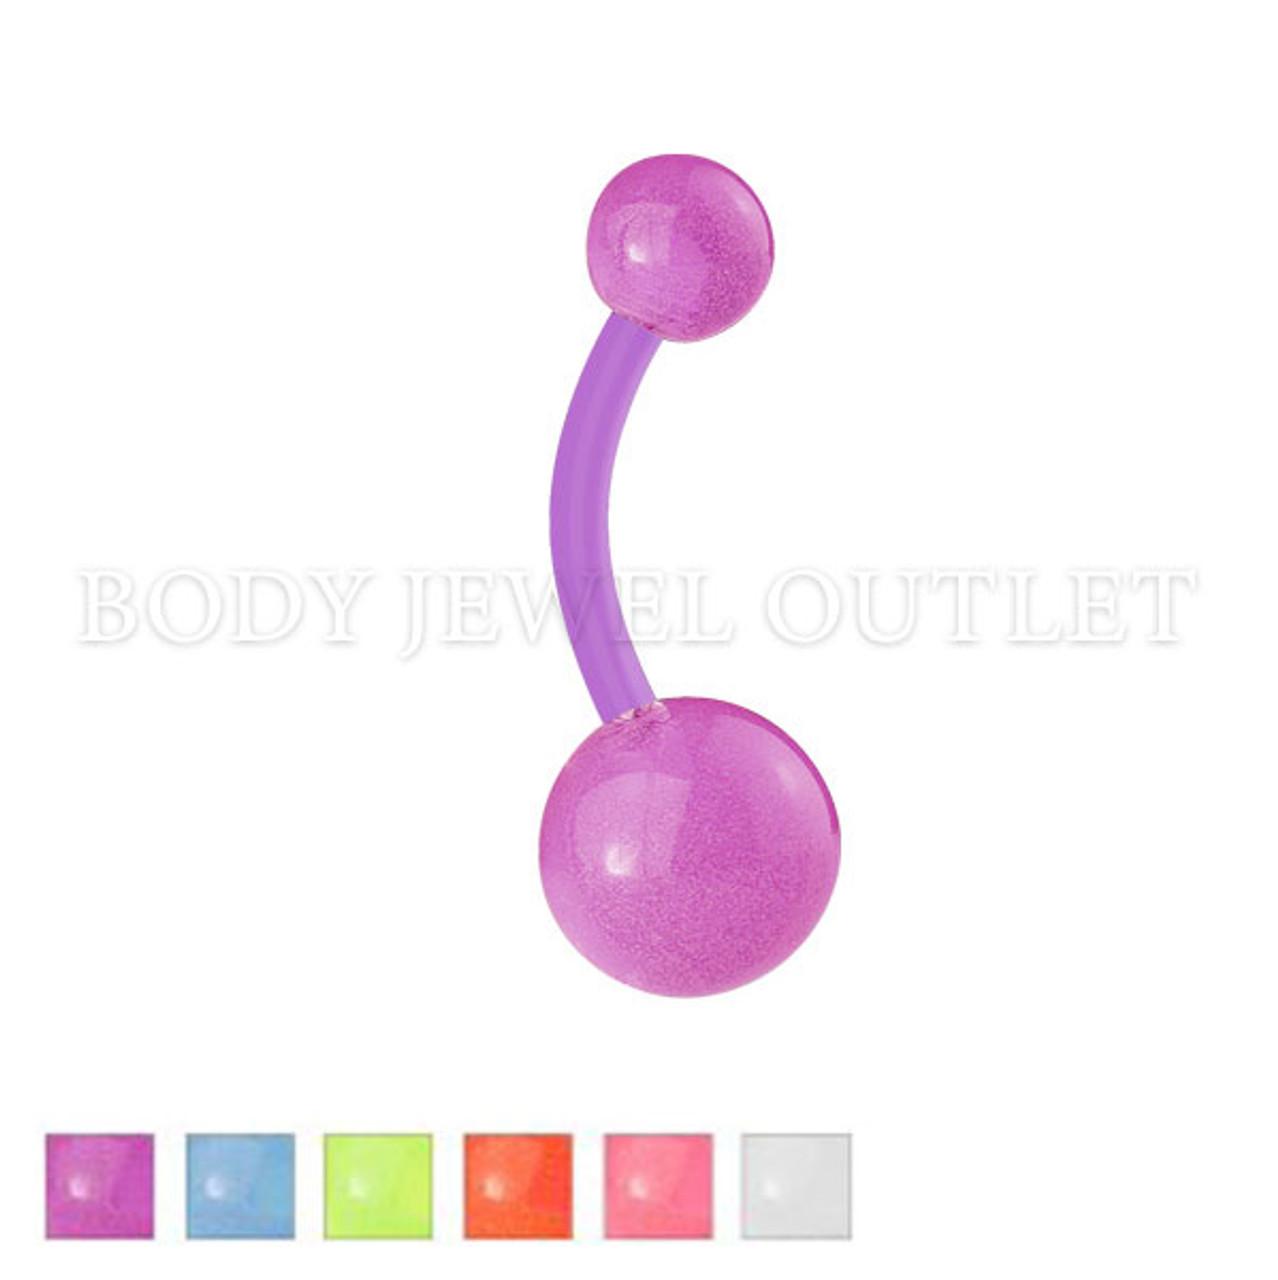 Bio Flex Belly Piercing with Glow in Dark   BodyJewelOutlet